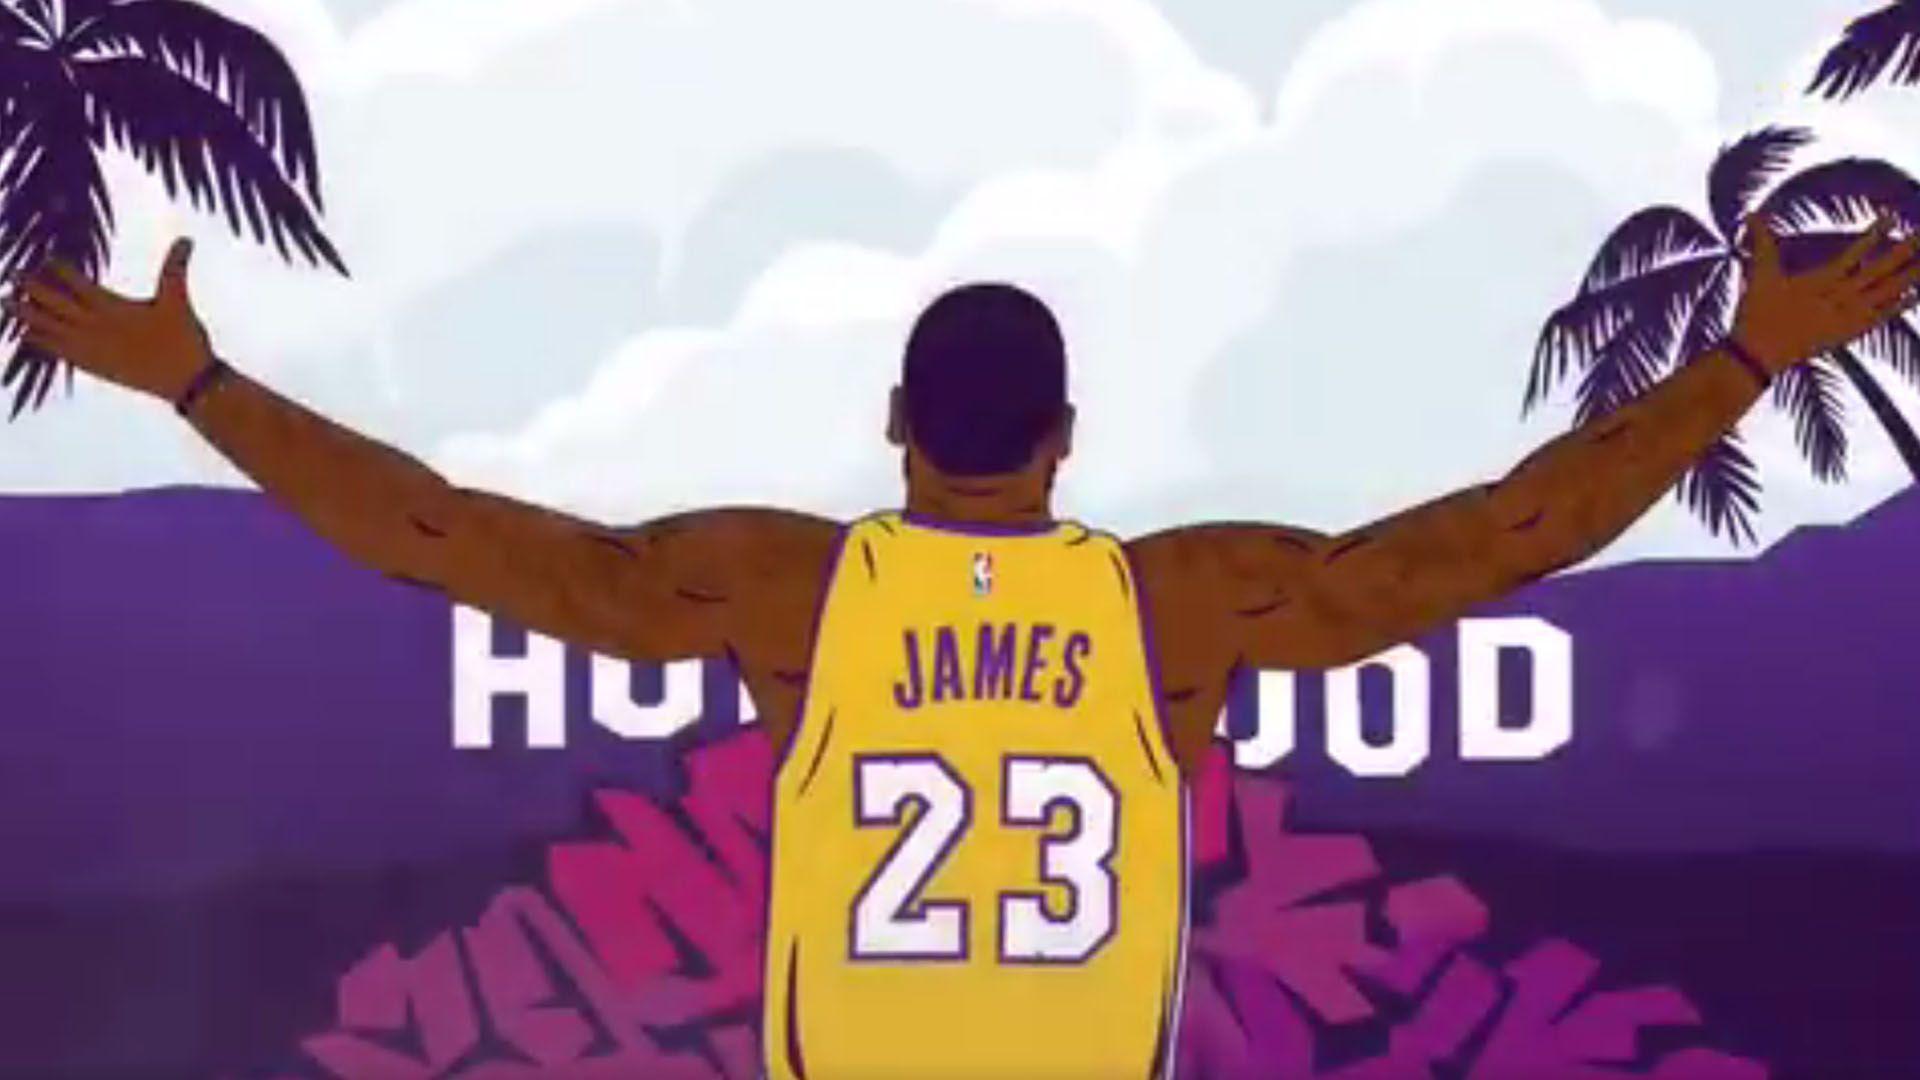 LeBron James Cartoon Wallpapers - Top Free LeBron James ...